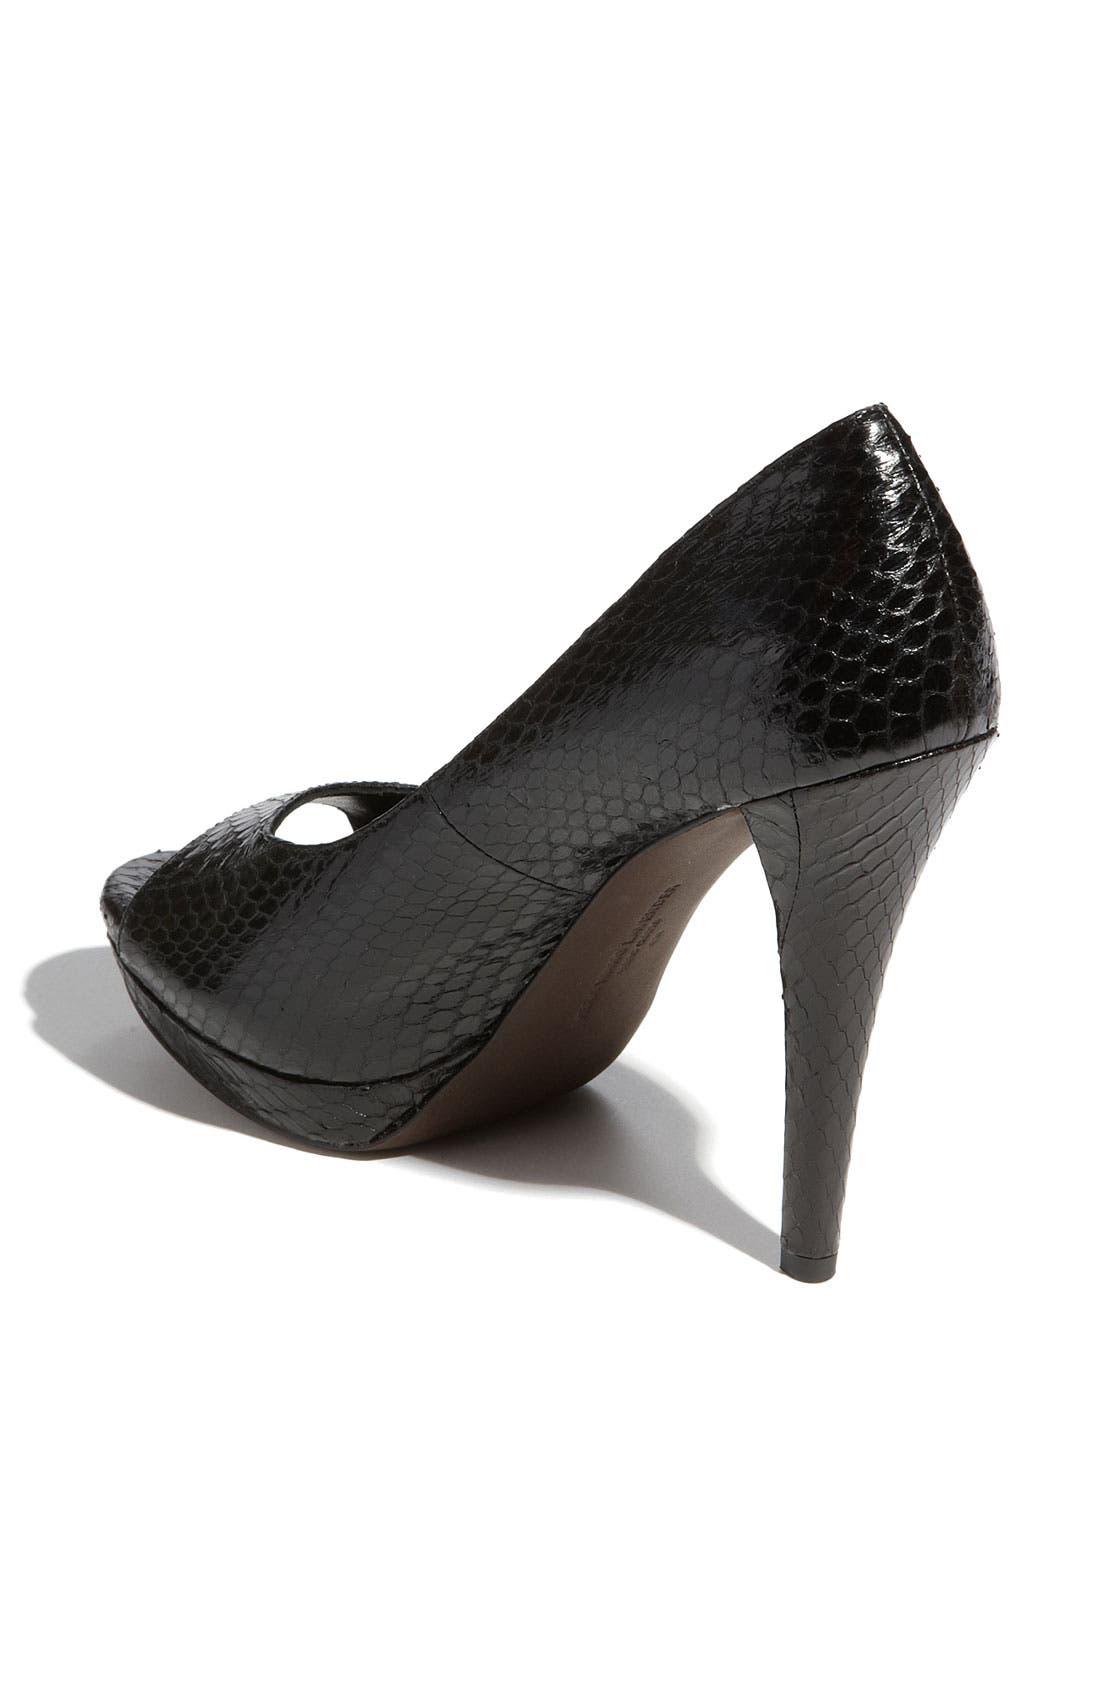 Footwear 'Selima' Peep Toe Pump,                             Alternate thumbnail 19, color,